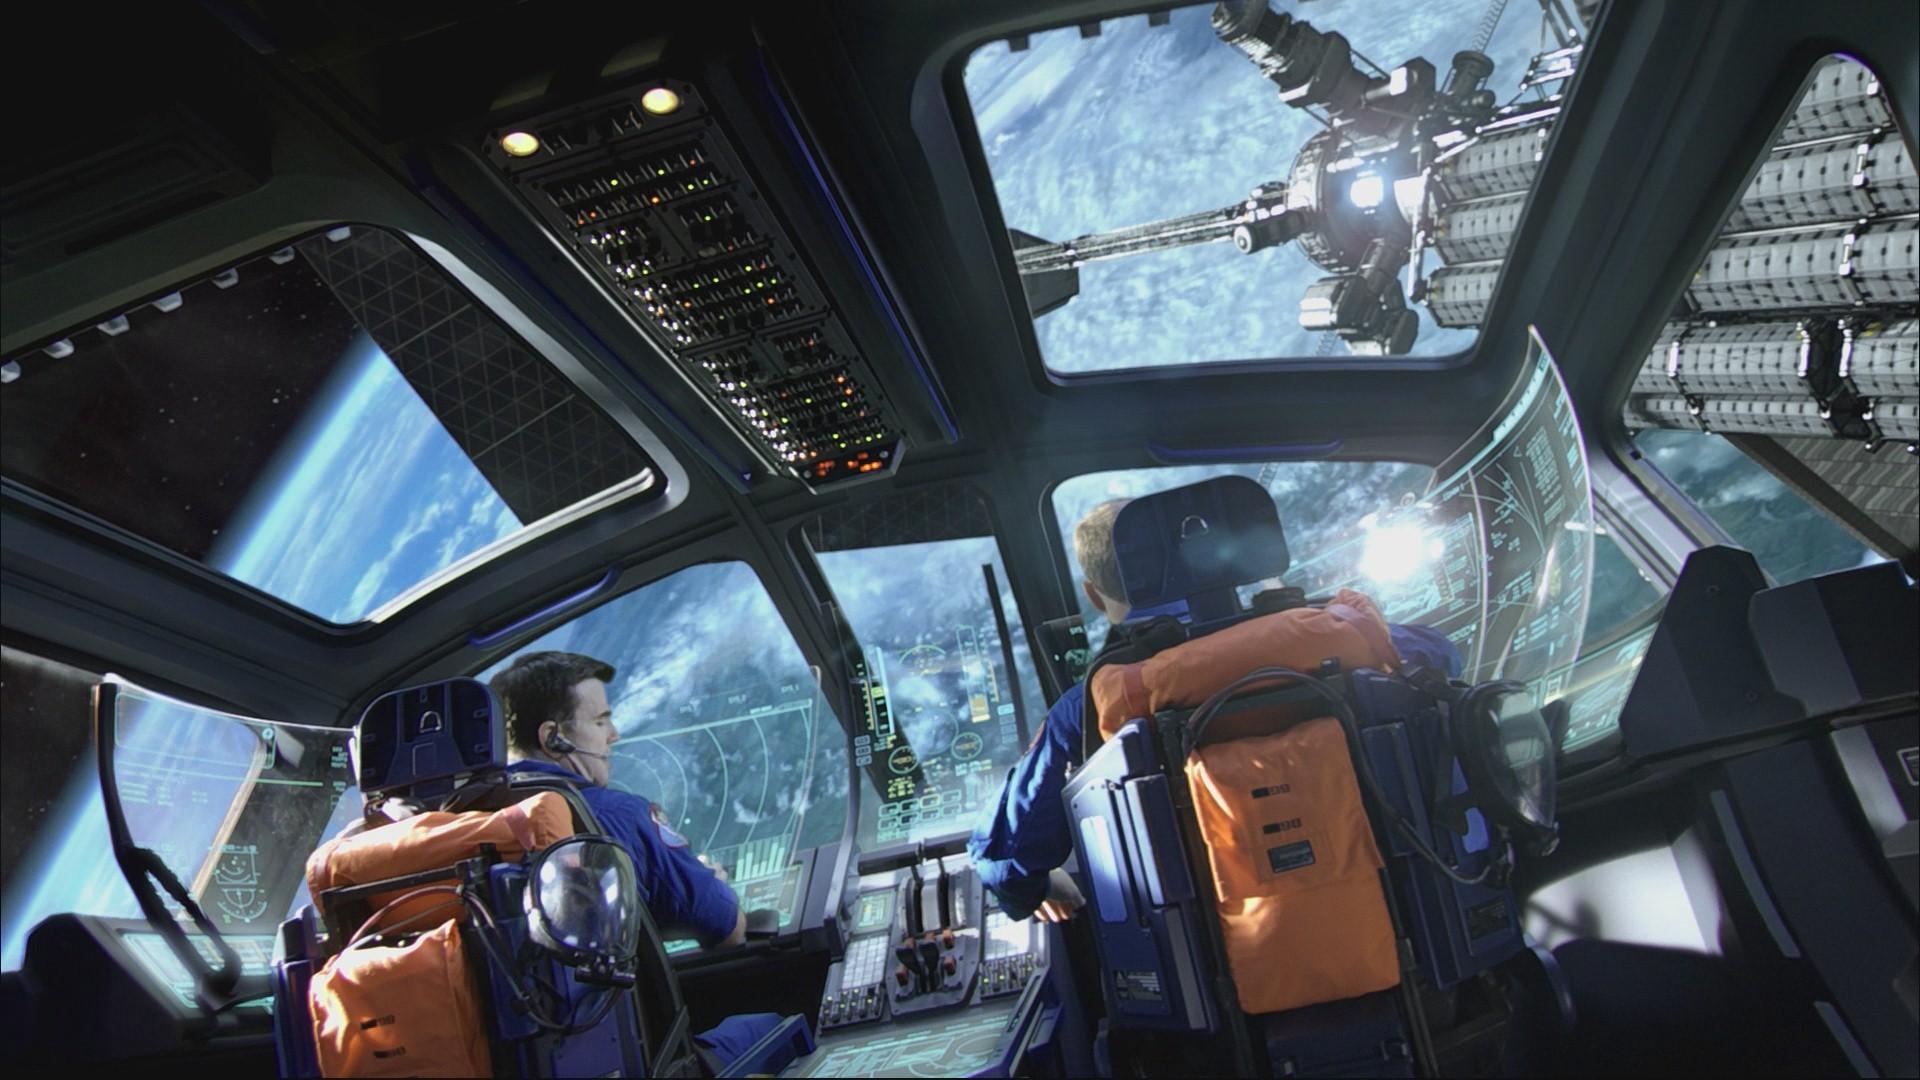 Prometheus, bridge, computeres, ai, ui, displays, cockpit, viewing deck    Environments – Sci-Fi Interiors   Pinterest   Decking, Bridge and Display